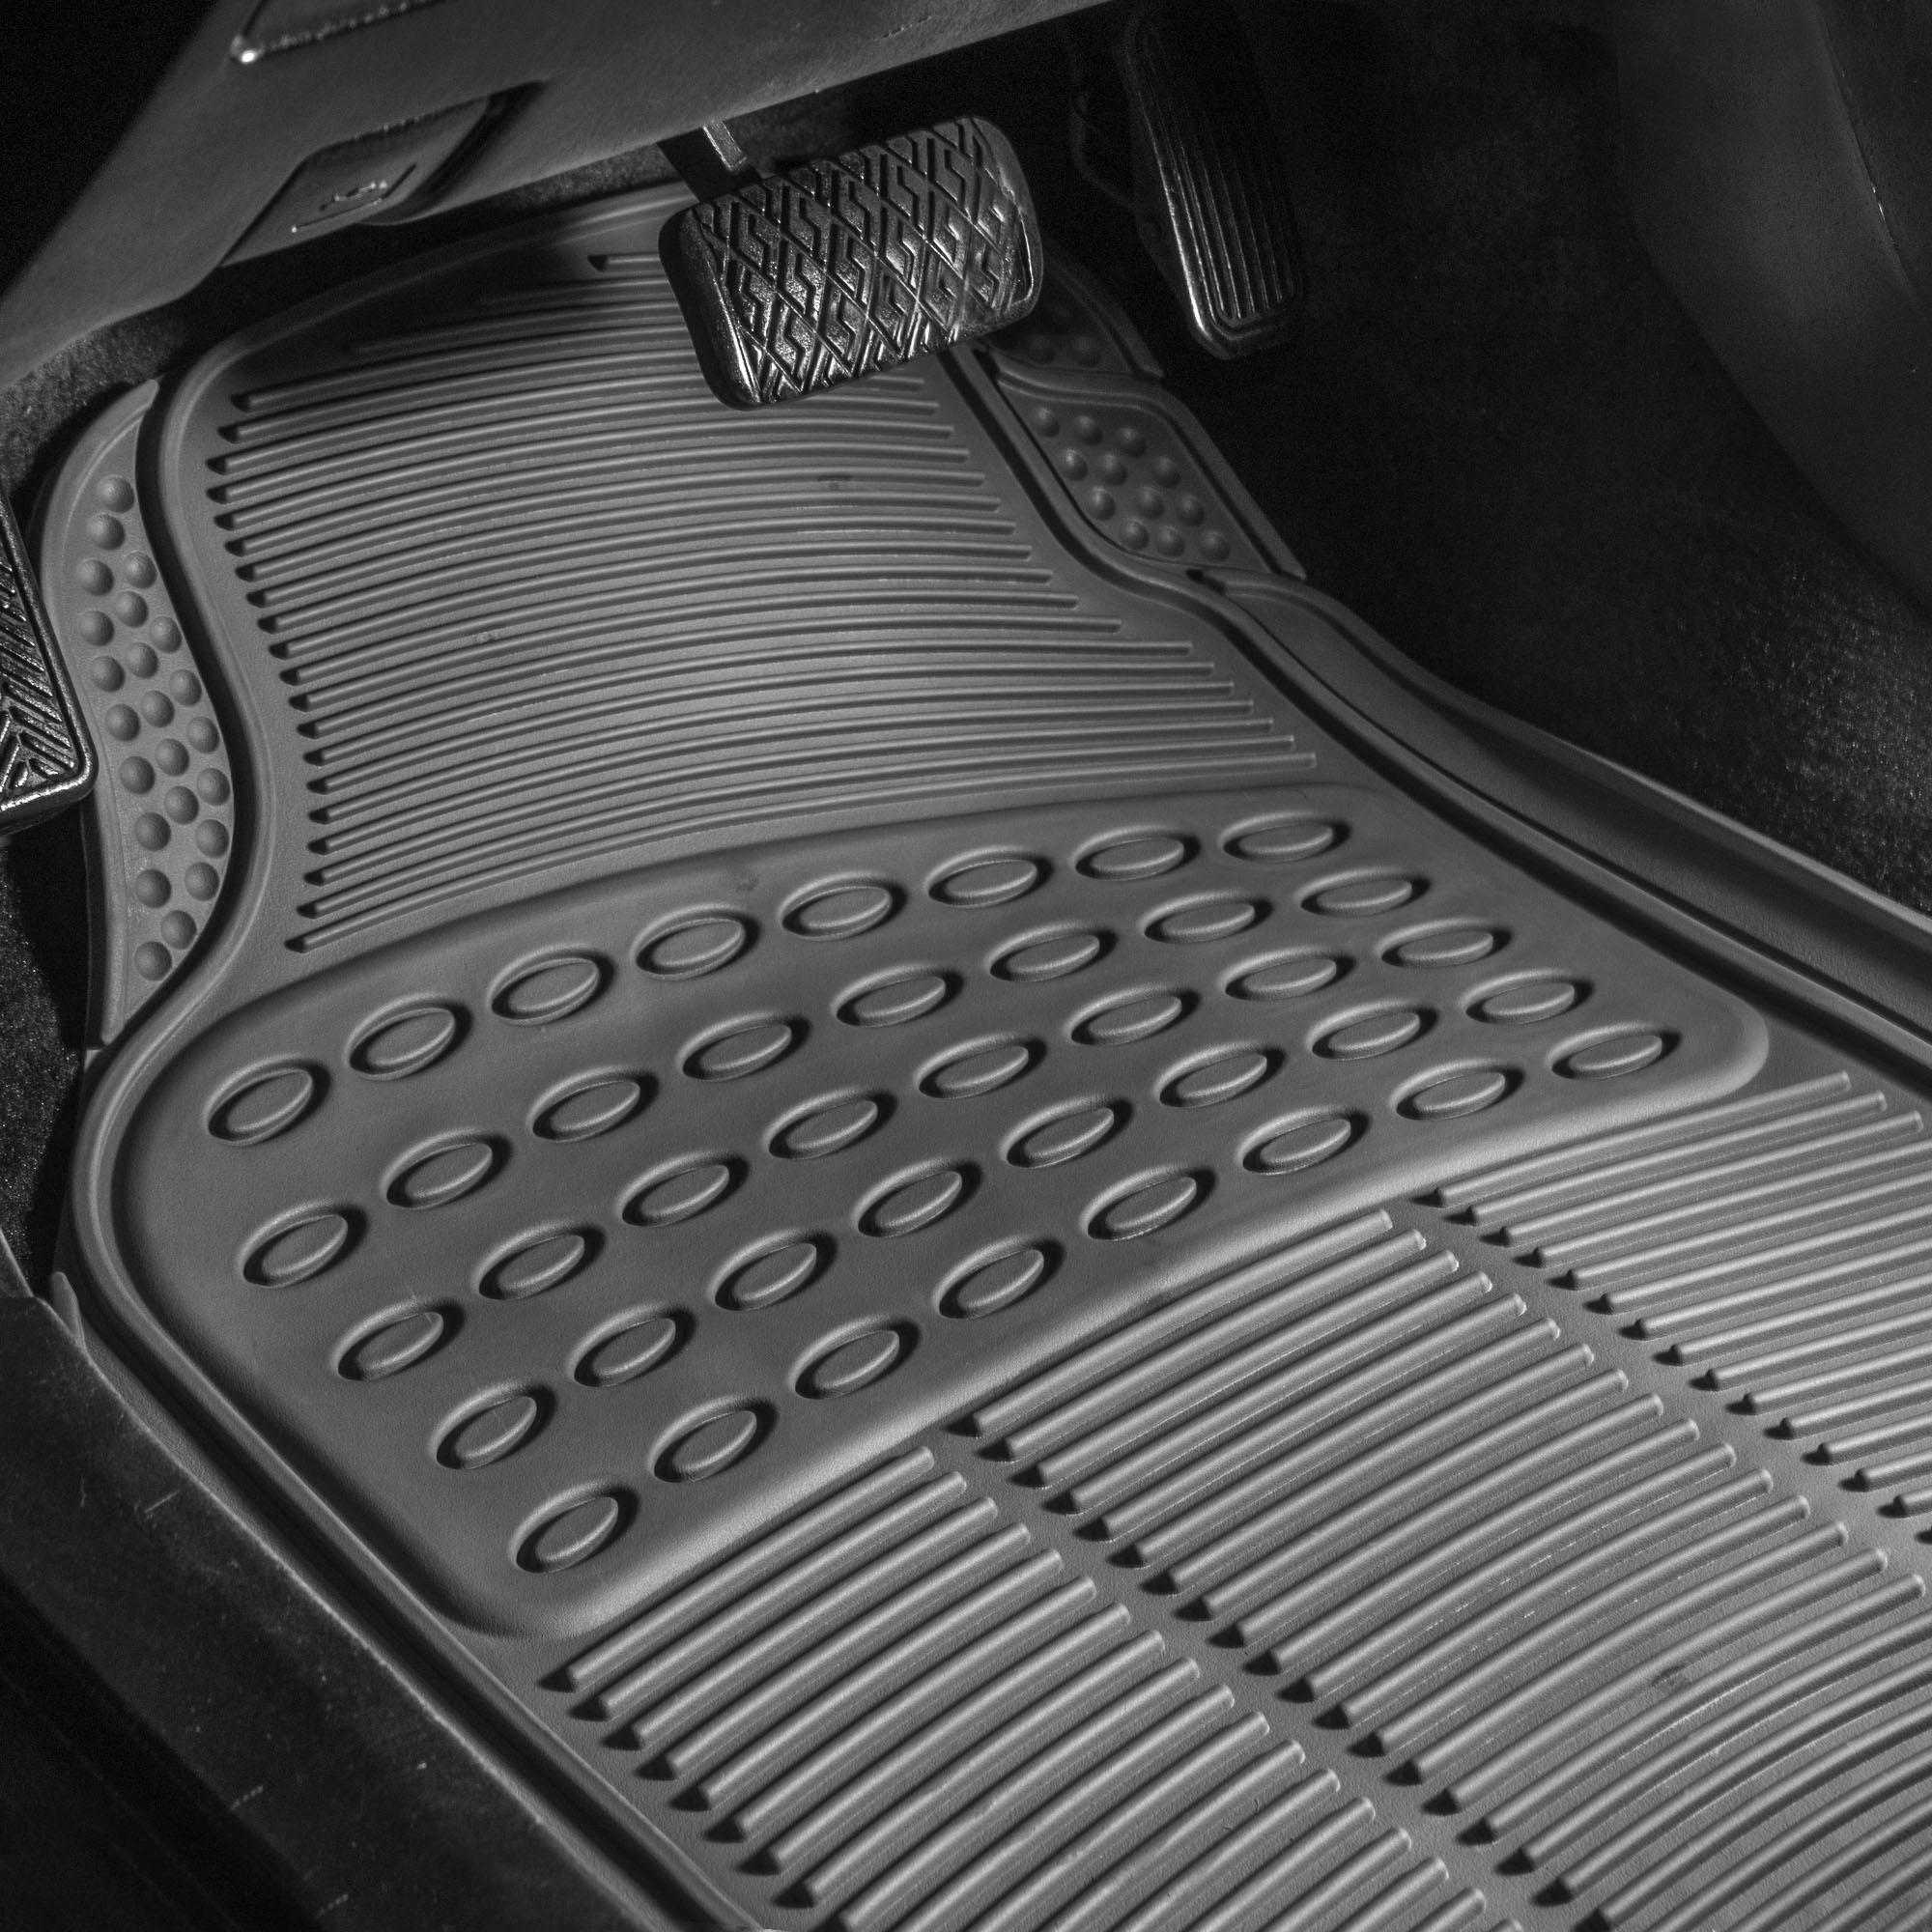 3pc-Floor-Mats-for-Auto-Car-SUV-Van-Heavy-Duty-3-Colors-w-Free-Gift thumbnail 19